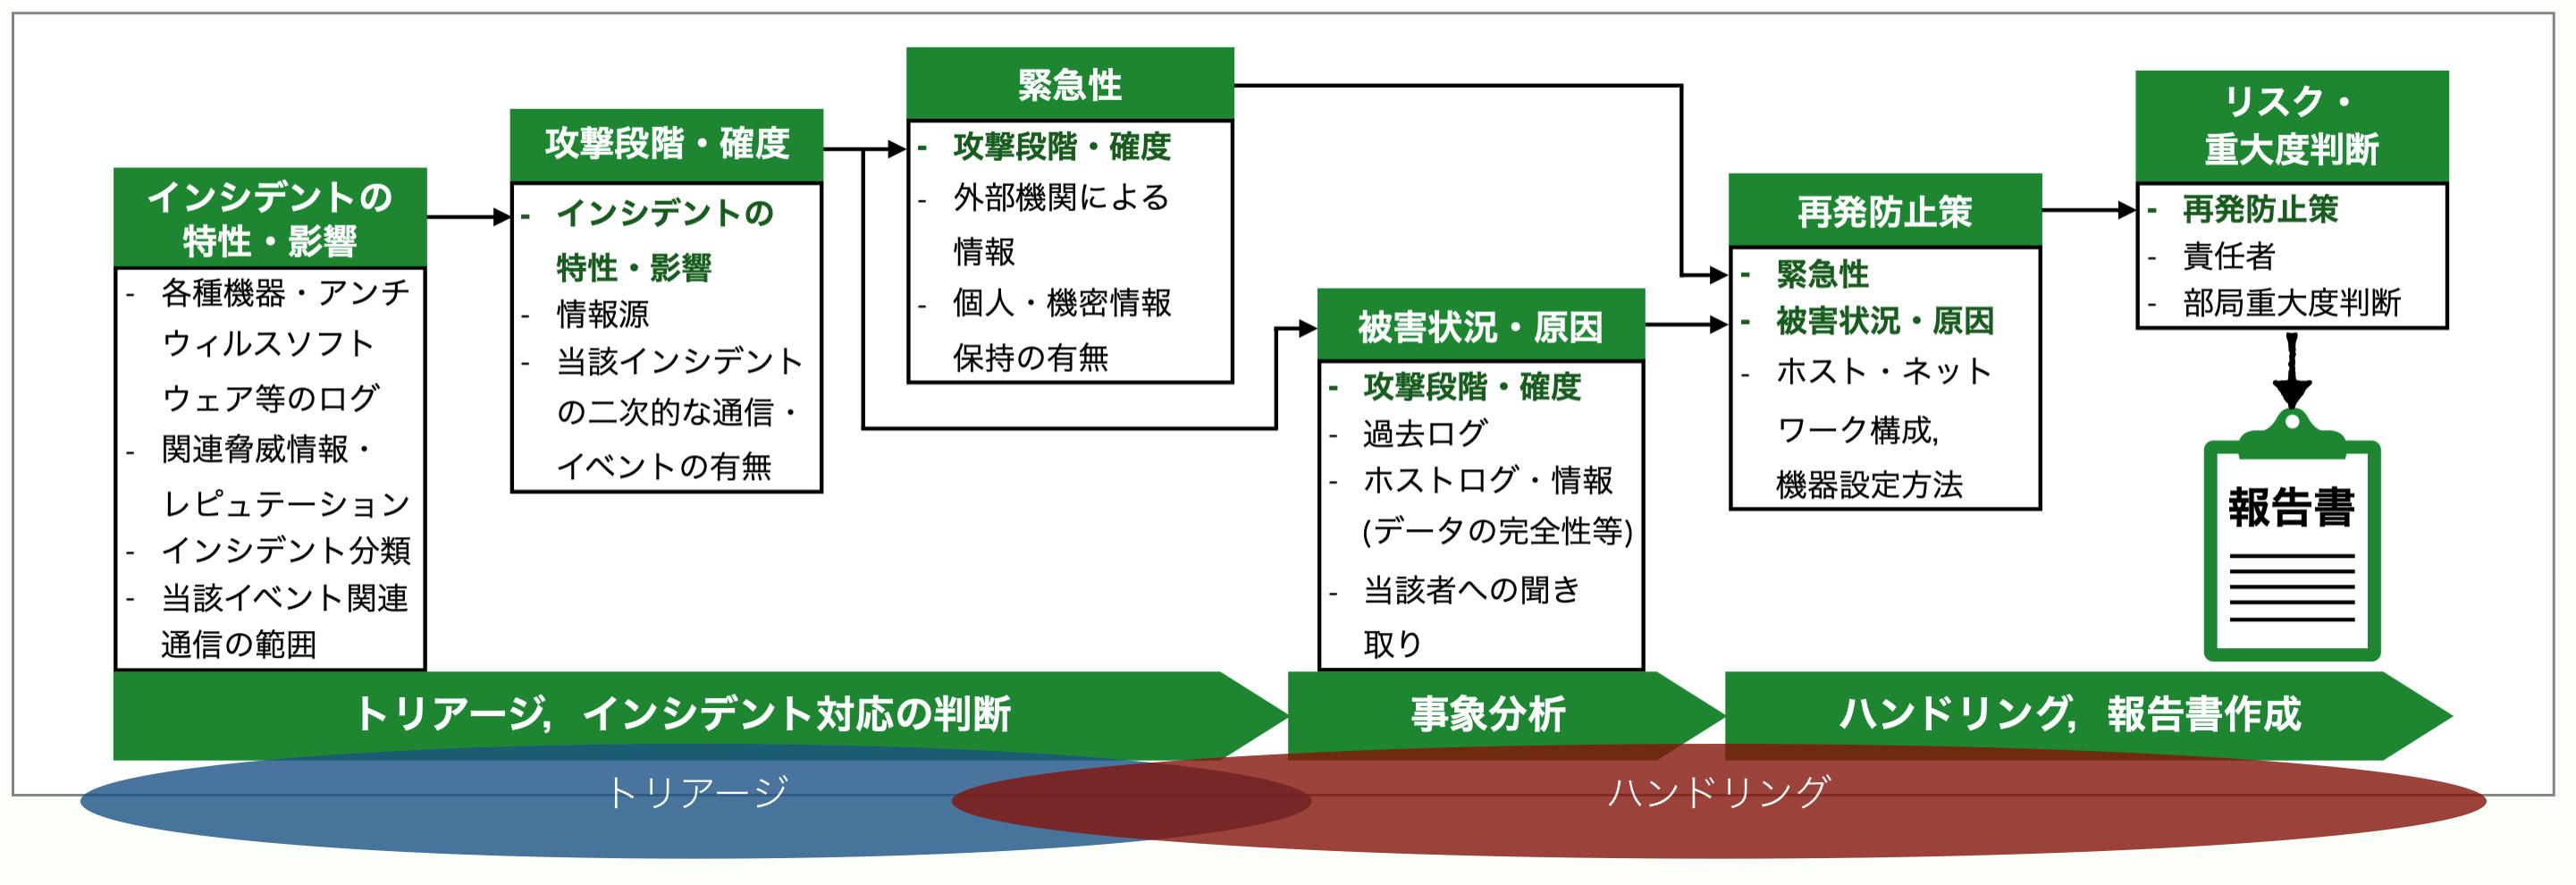 Workflow1